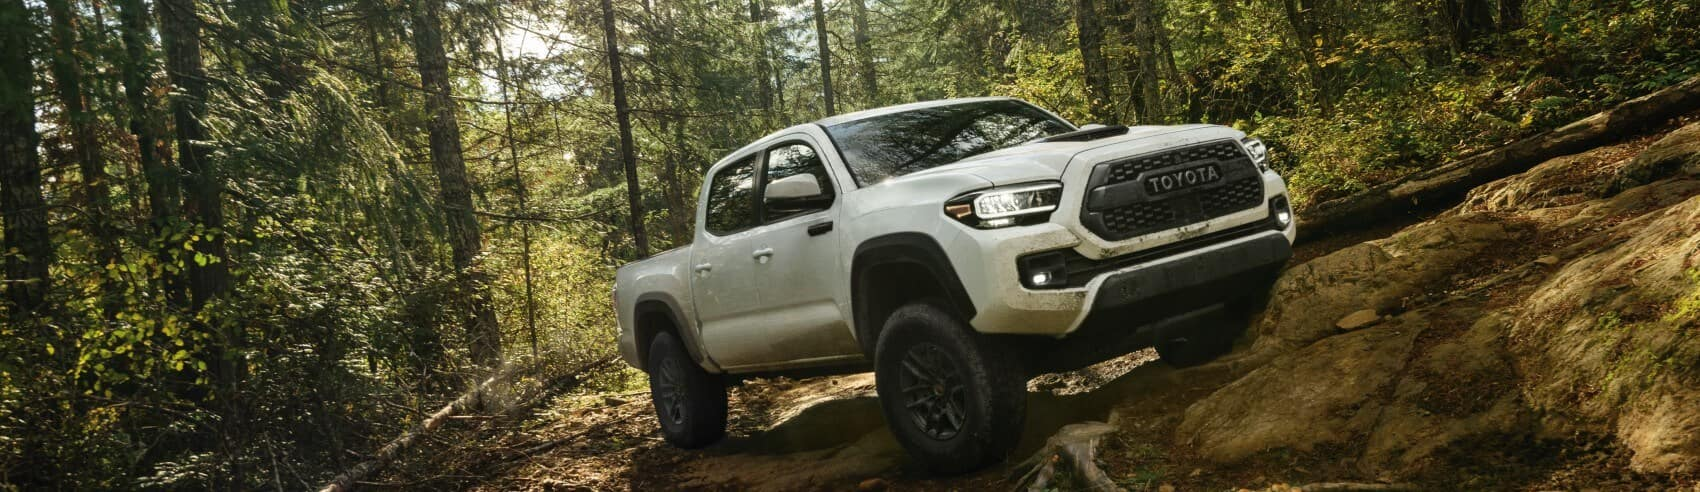 Toyota Tacoma Trim Levels